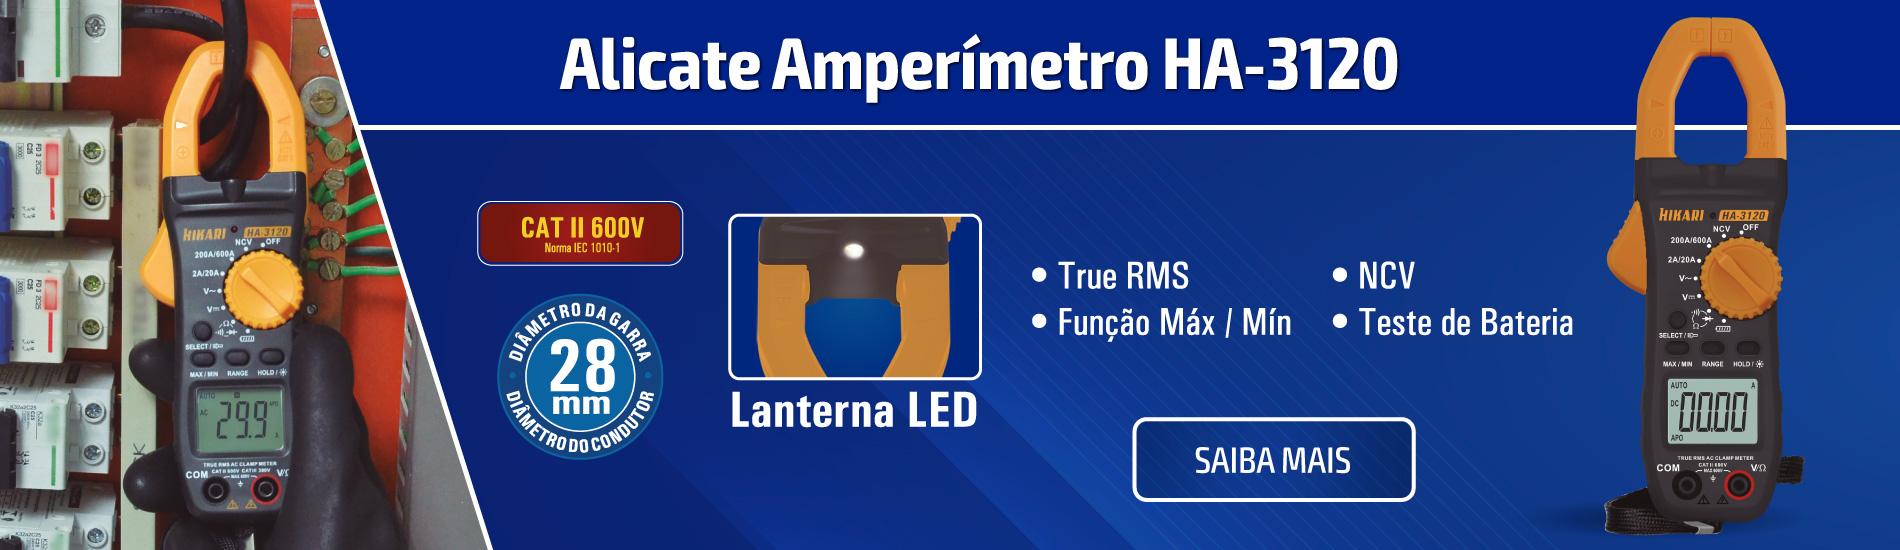 Alicate Amperímetro Digital True RMS CATII 600V Hikari HA-3120